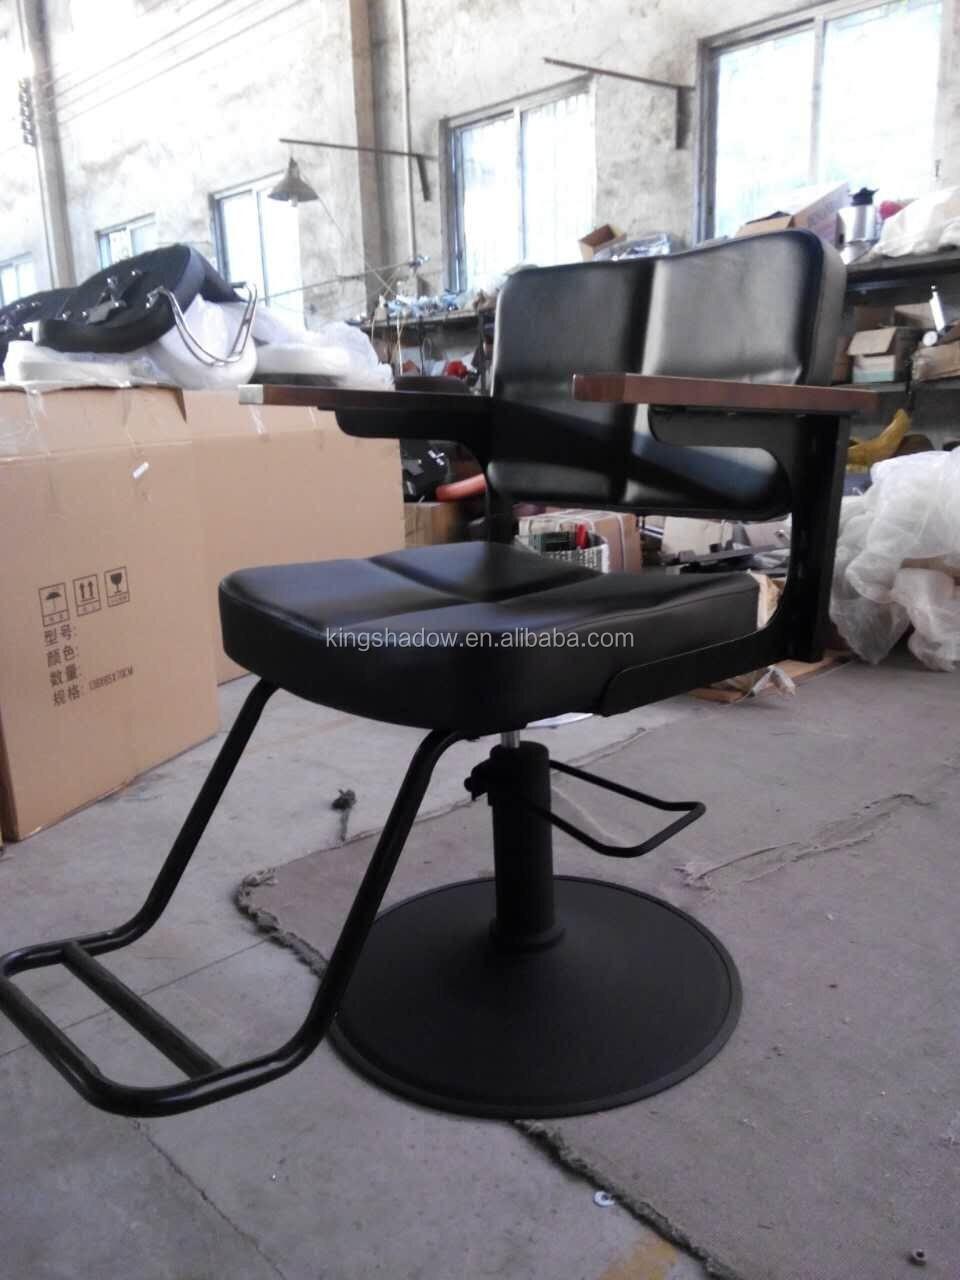 Friseursalons Gewidmet Friseur Stuhl In Barber Stuhl Ausgezeichnete QualitäT Friseur Stuhl